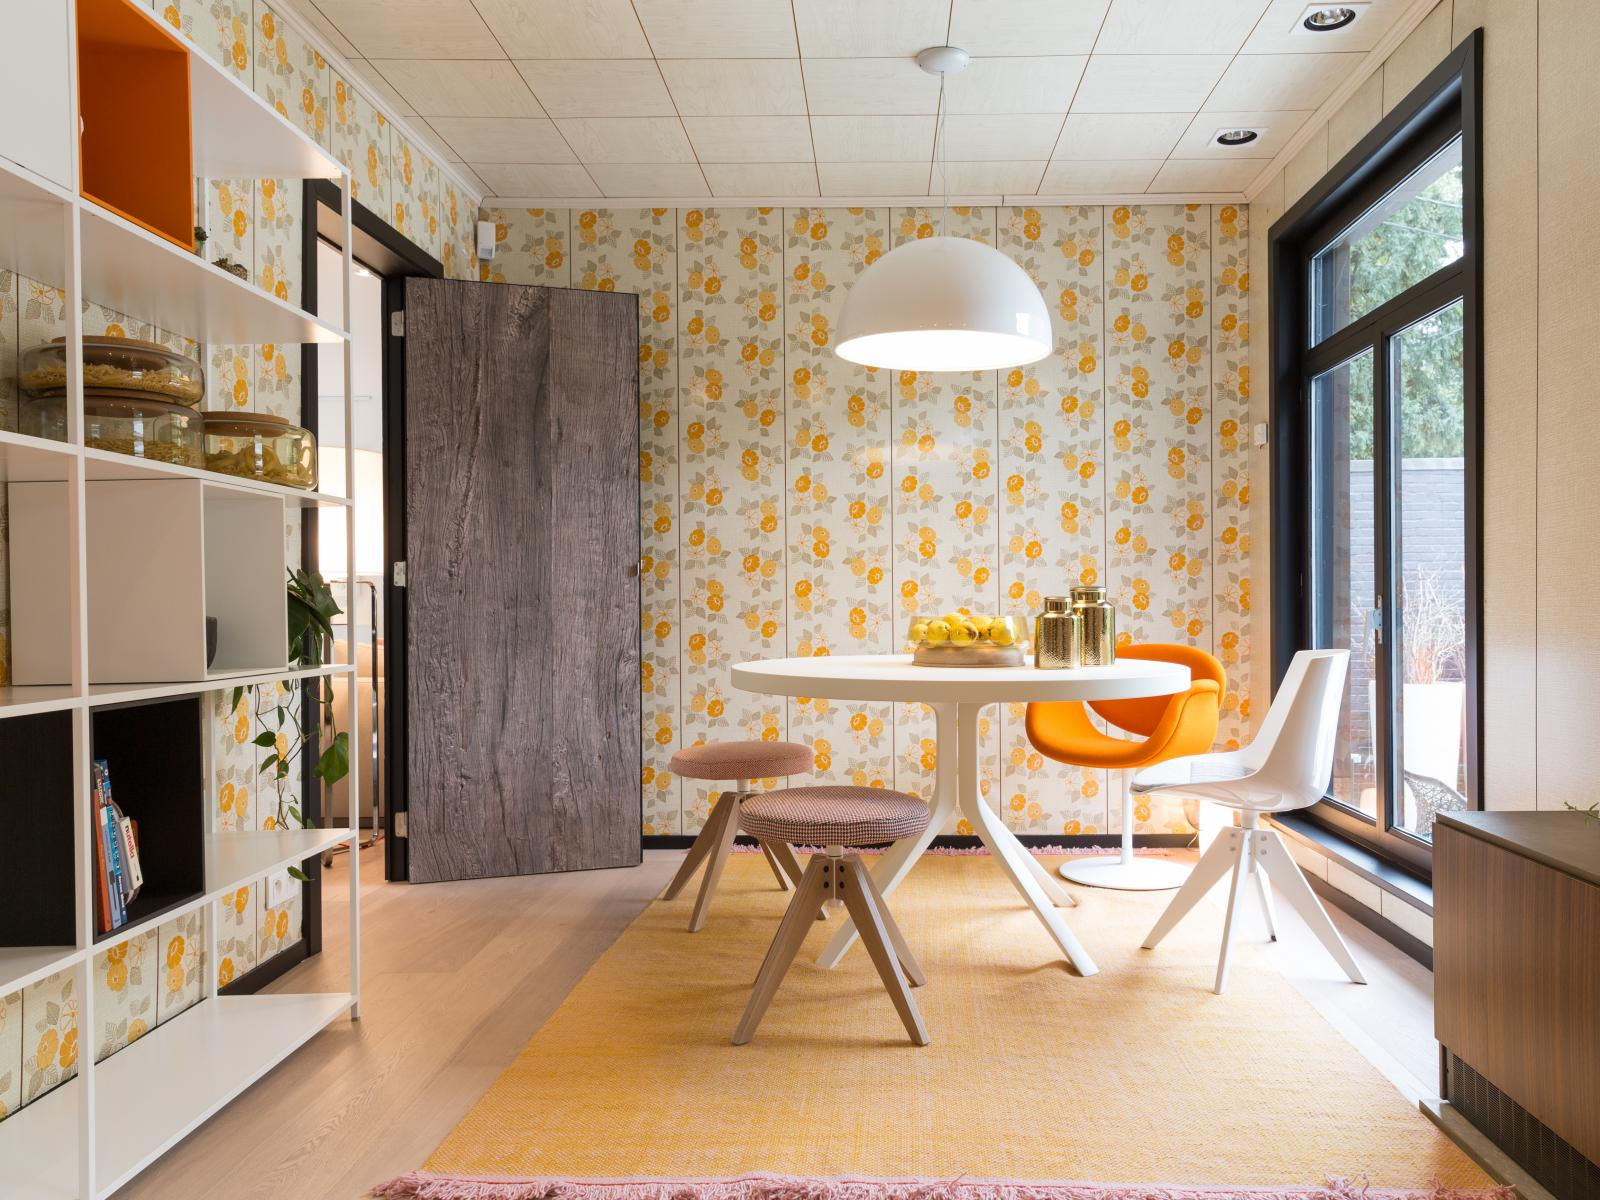 danskina duotone tapijt. Black Bedroom Furniture Sets. Home Design Ideas